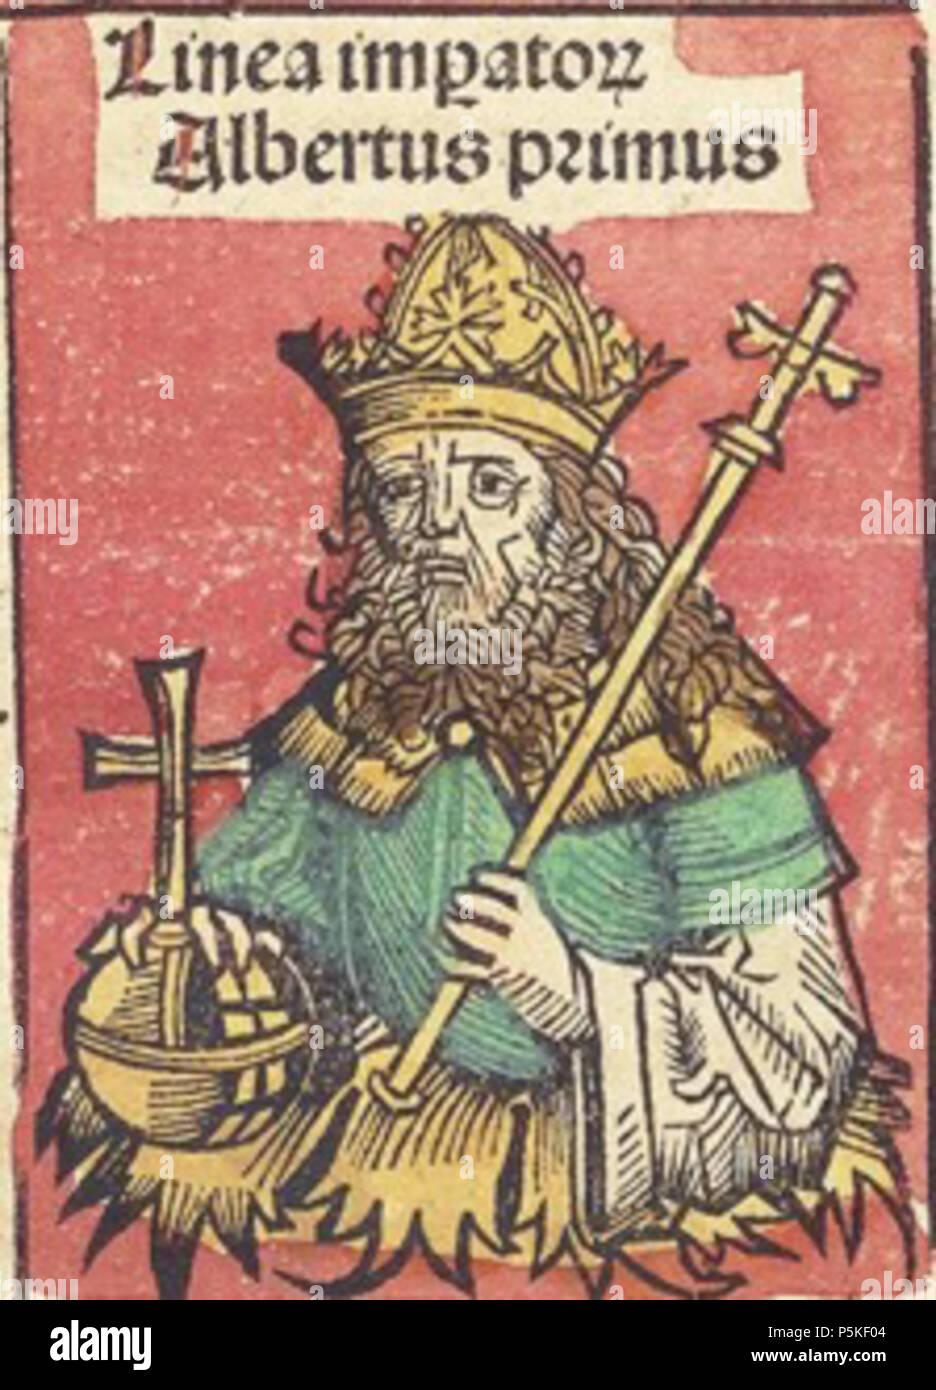 N/A. eština: Albrecht I. habsburský . 1493. Text: Hartmann Schedel; Illustrations: Michel Wolgemut, Wilhelm Pleydenwurff 75 Albrecht1 1493 - Stock Image